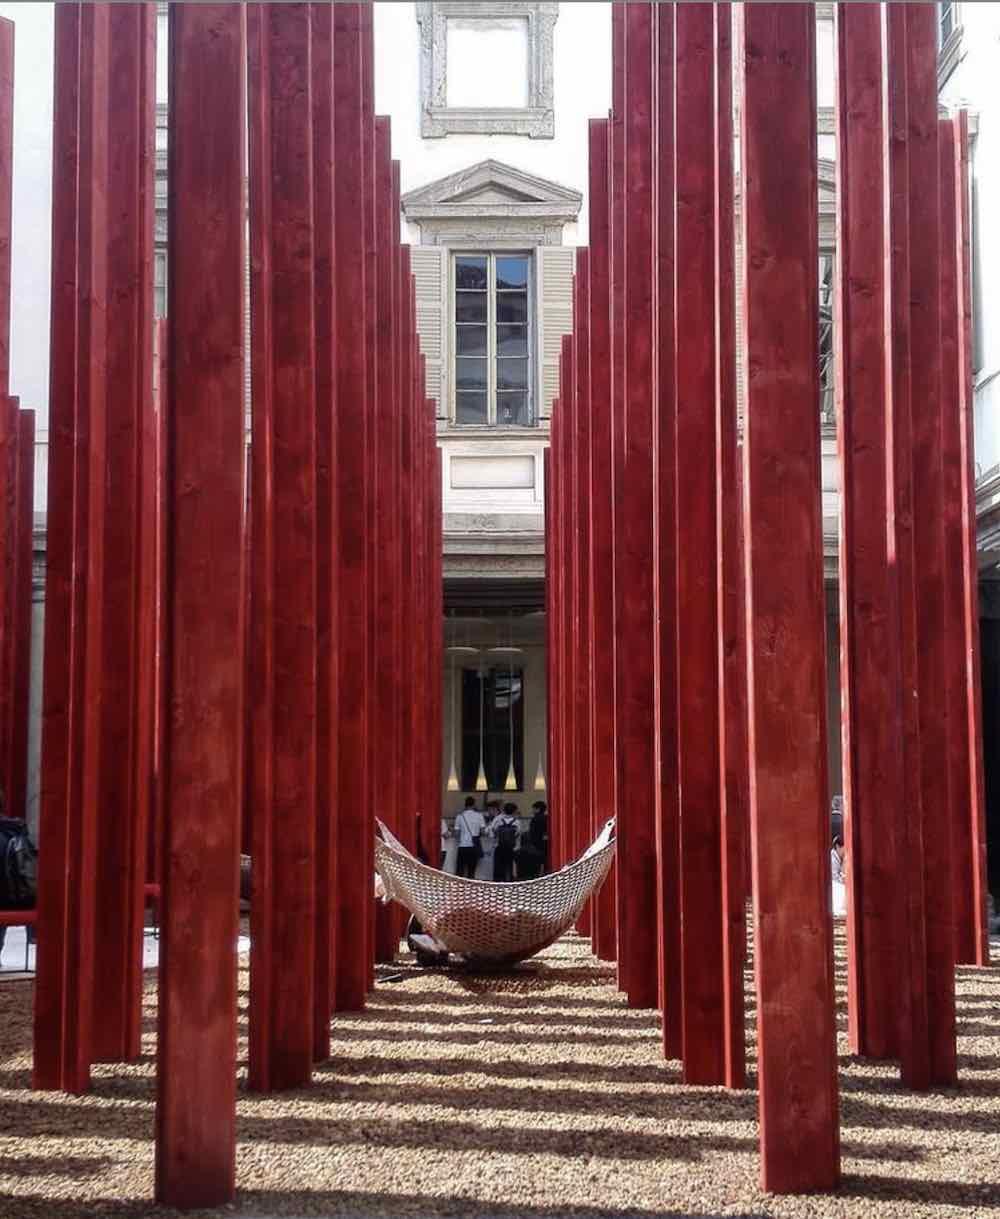 Asif Khan's installation at Palazzo Litta, Fuorisalone 2018 - Photo via IG via @reb_elle